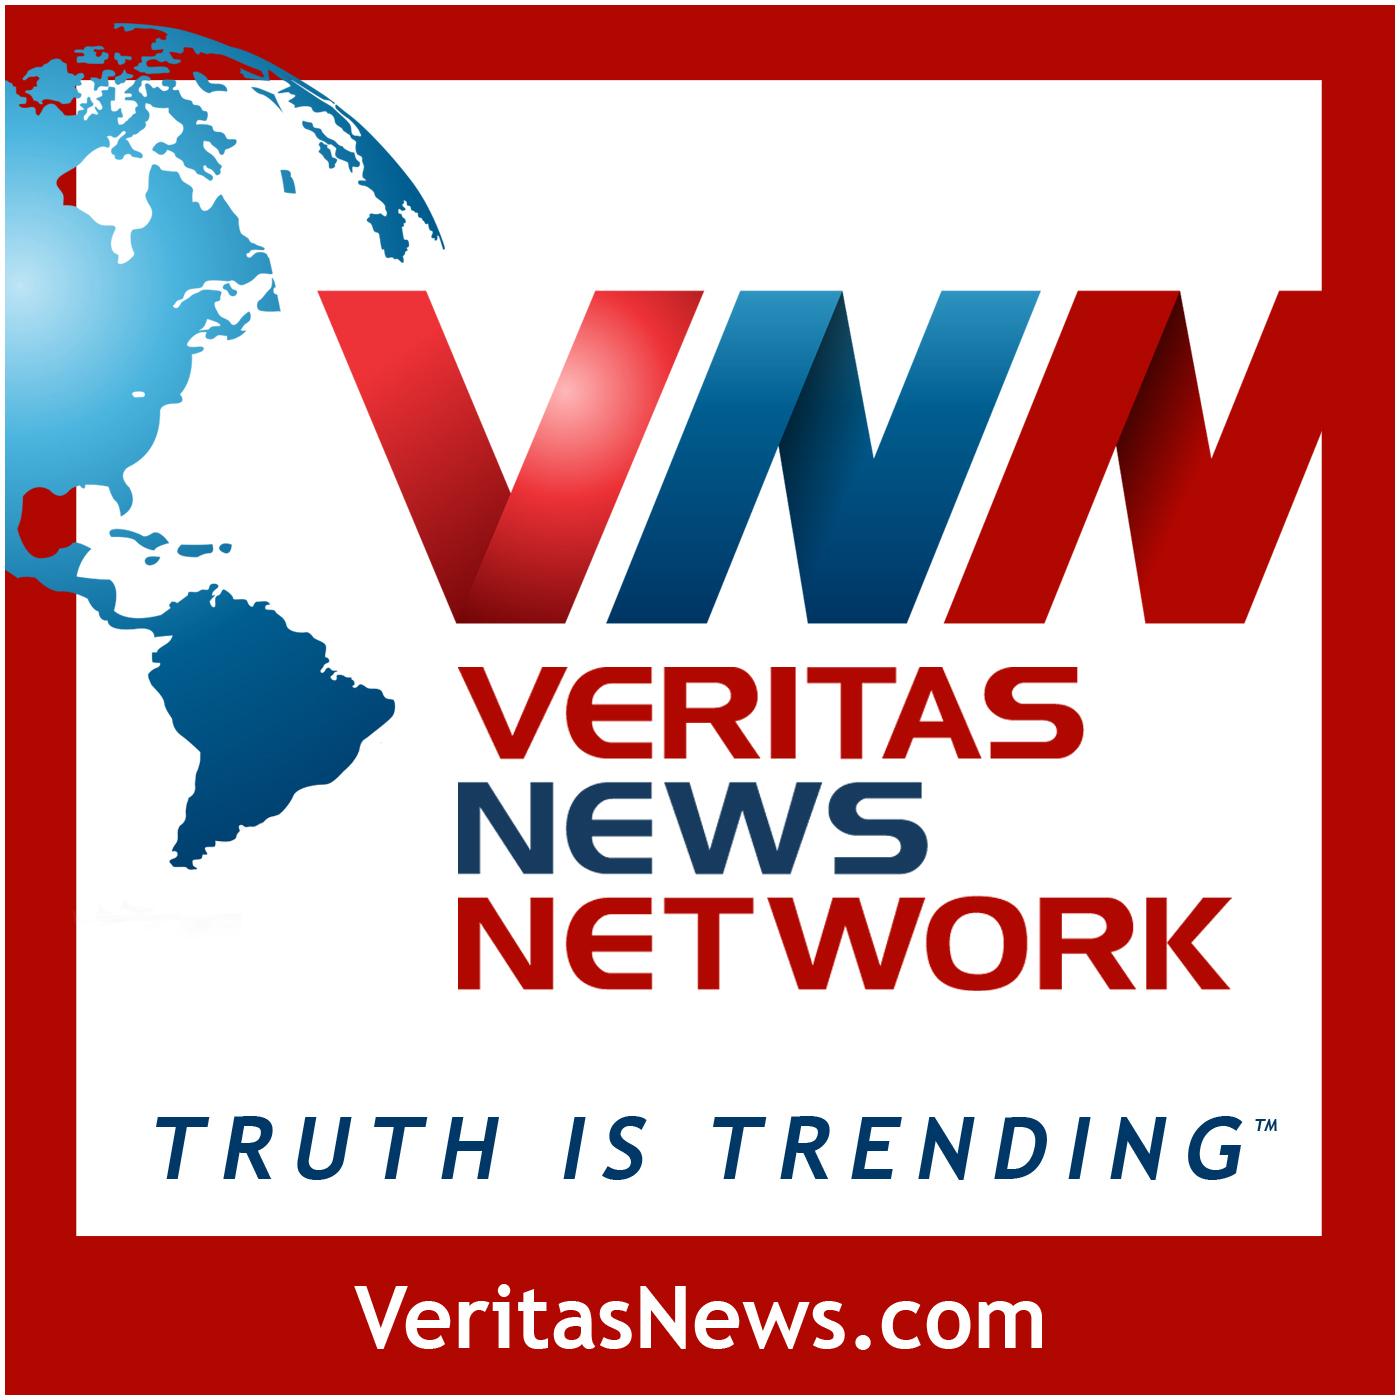 Veritas News Network - Truth is Trending